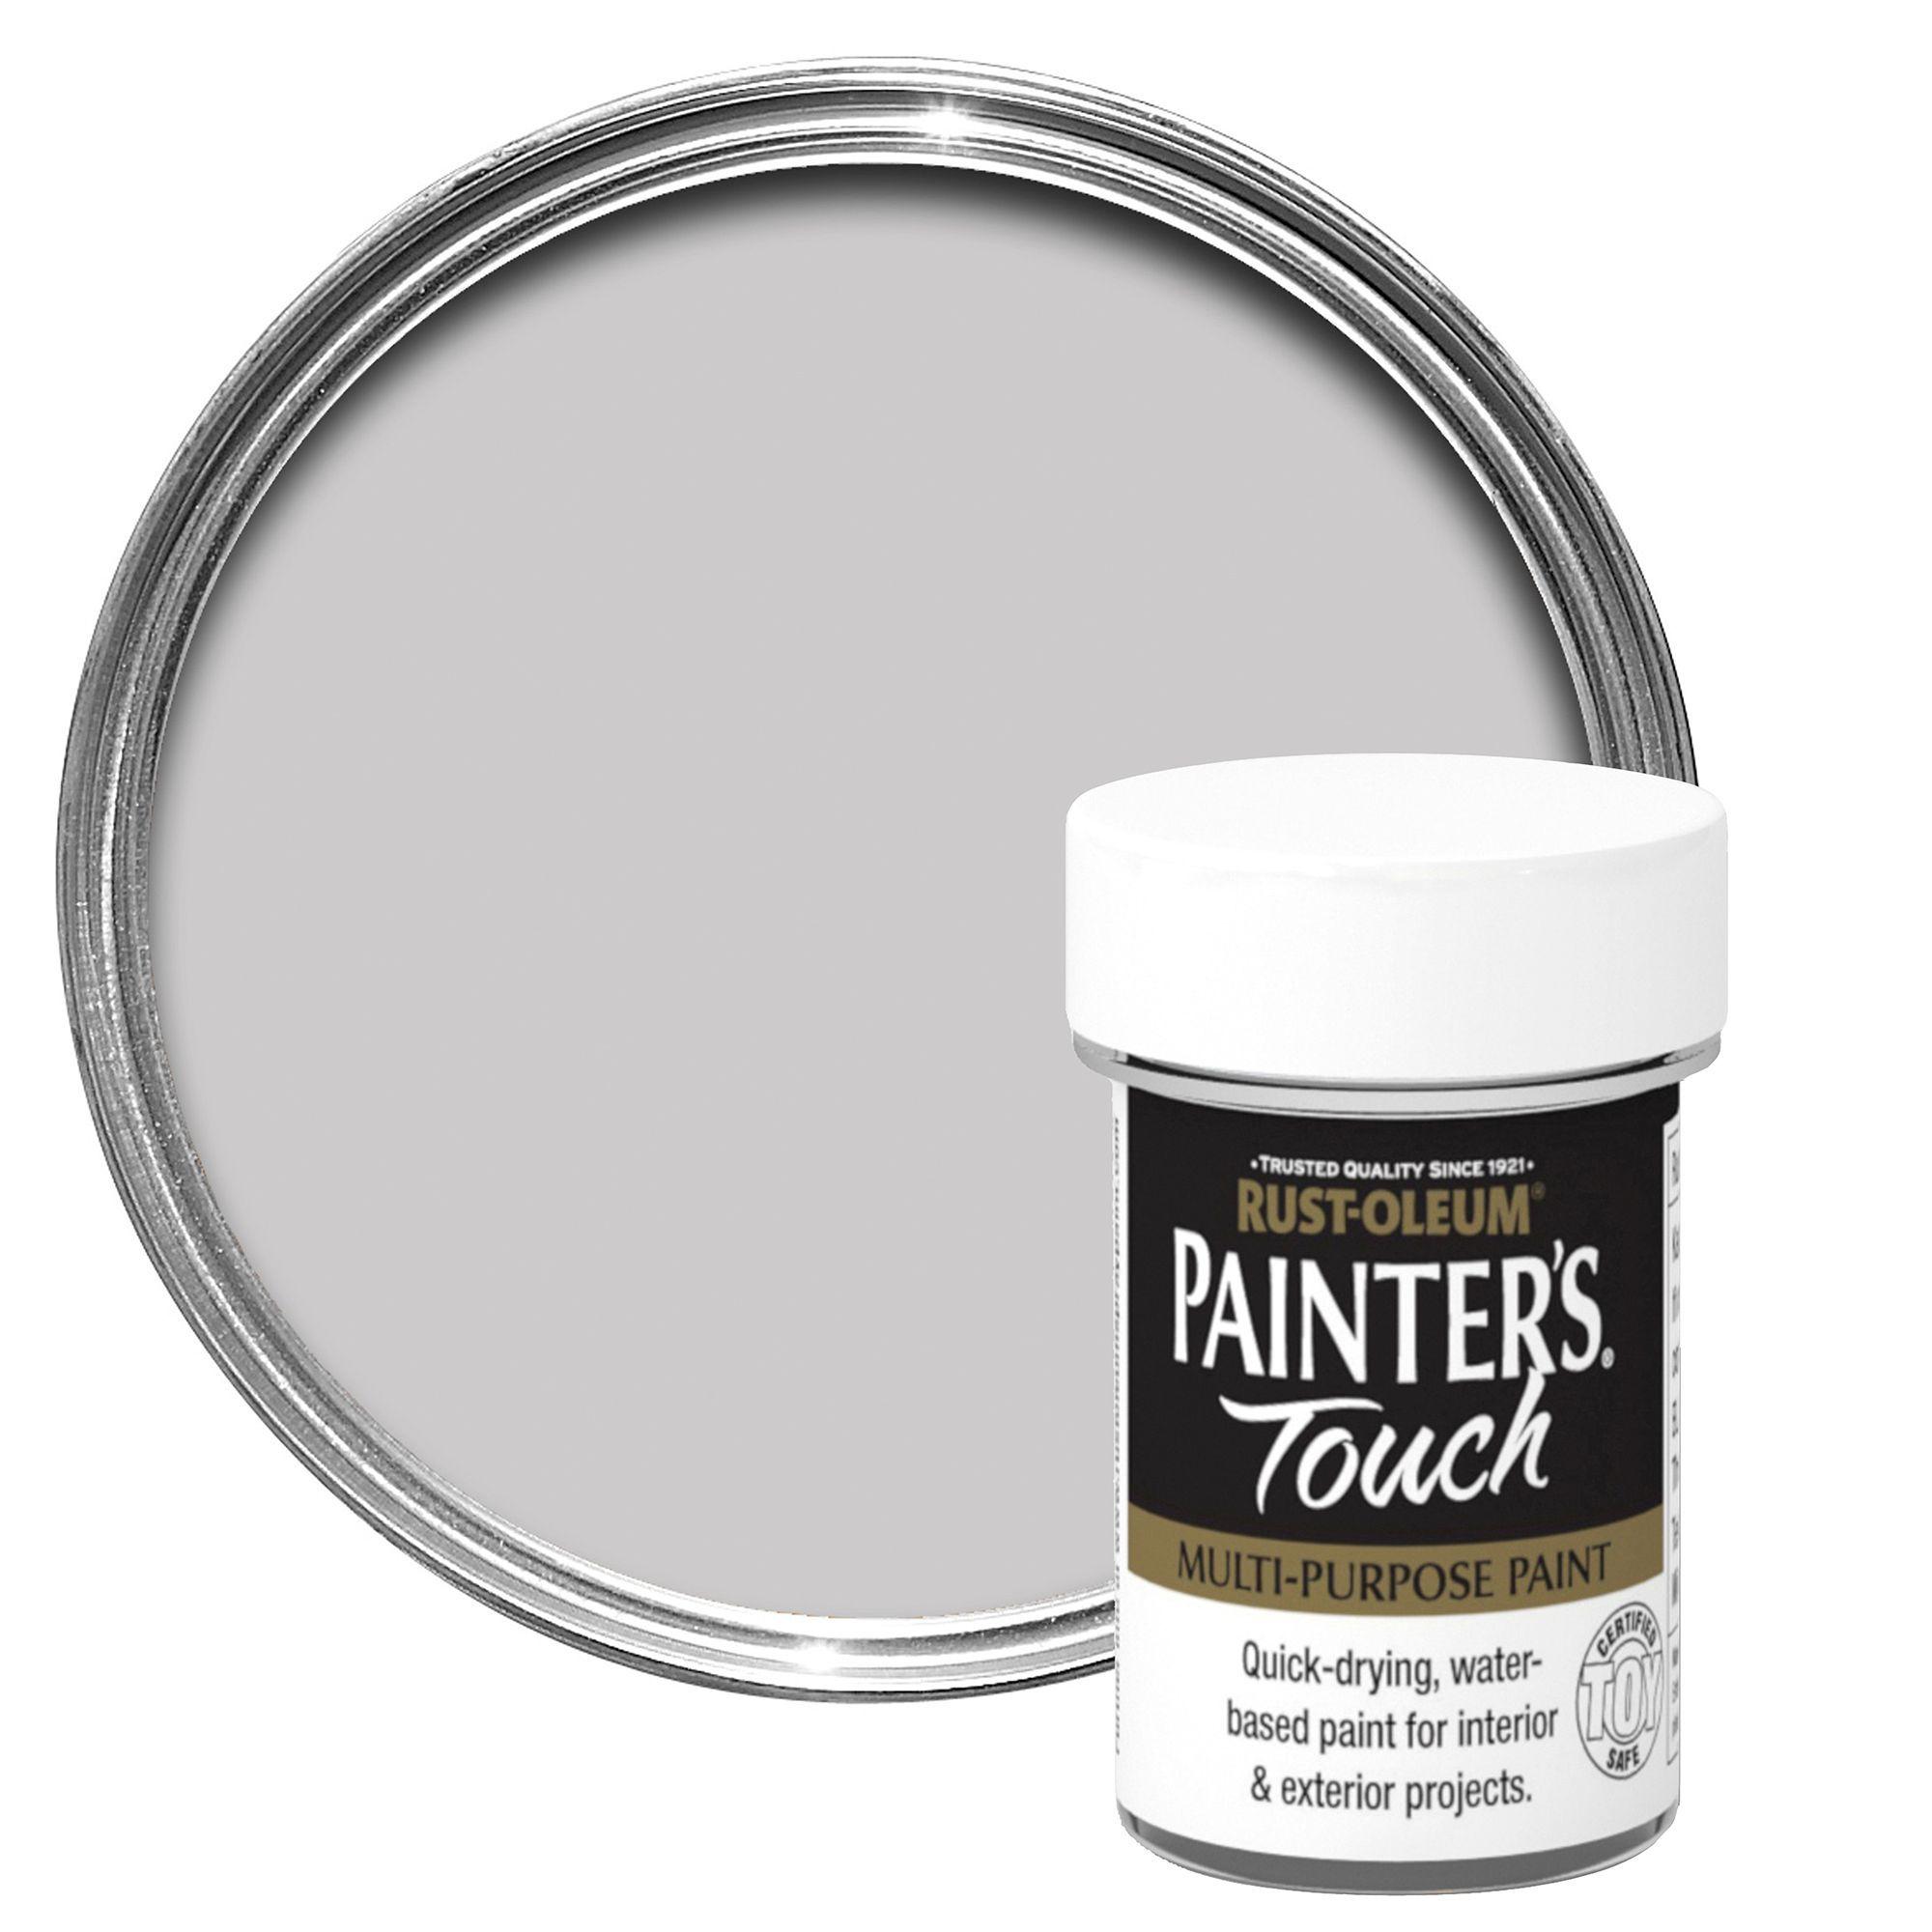 Rust-Oleum Painter's Touch Interior & Exterior Silver Gloss Multipurpose Paint 20ml